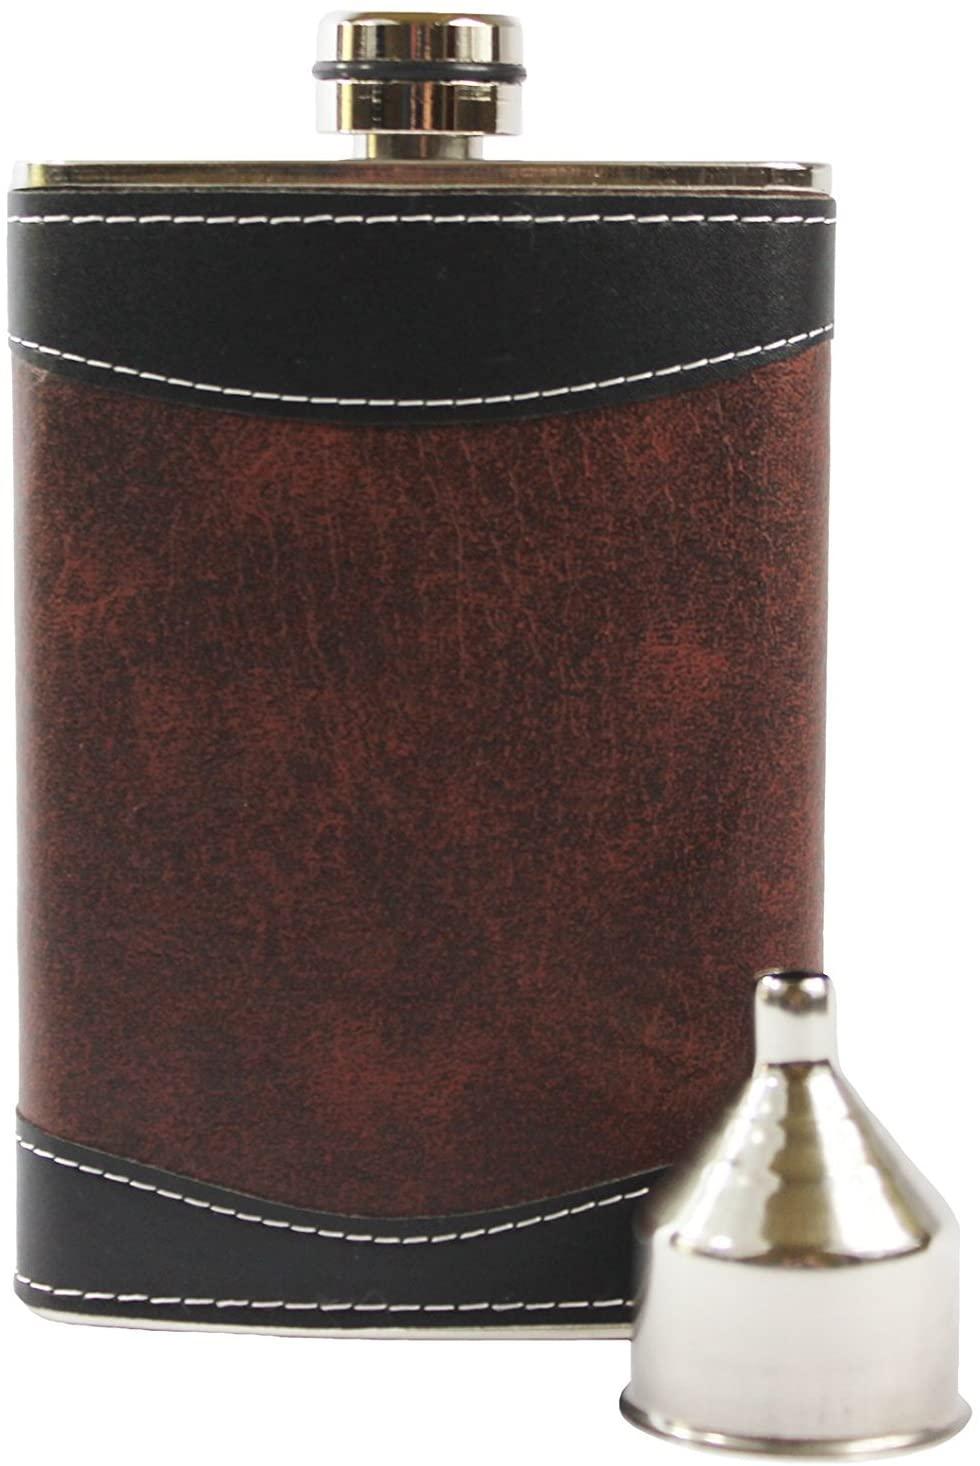 Primo Liquor Flasks Stainless Steel Primo Hip Flask Set